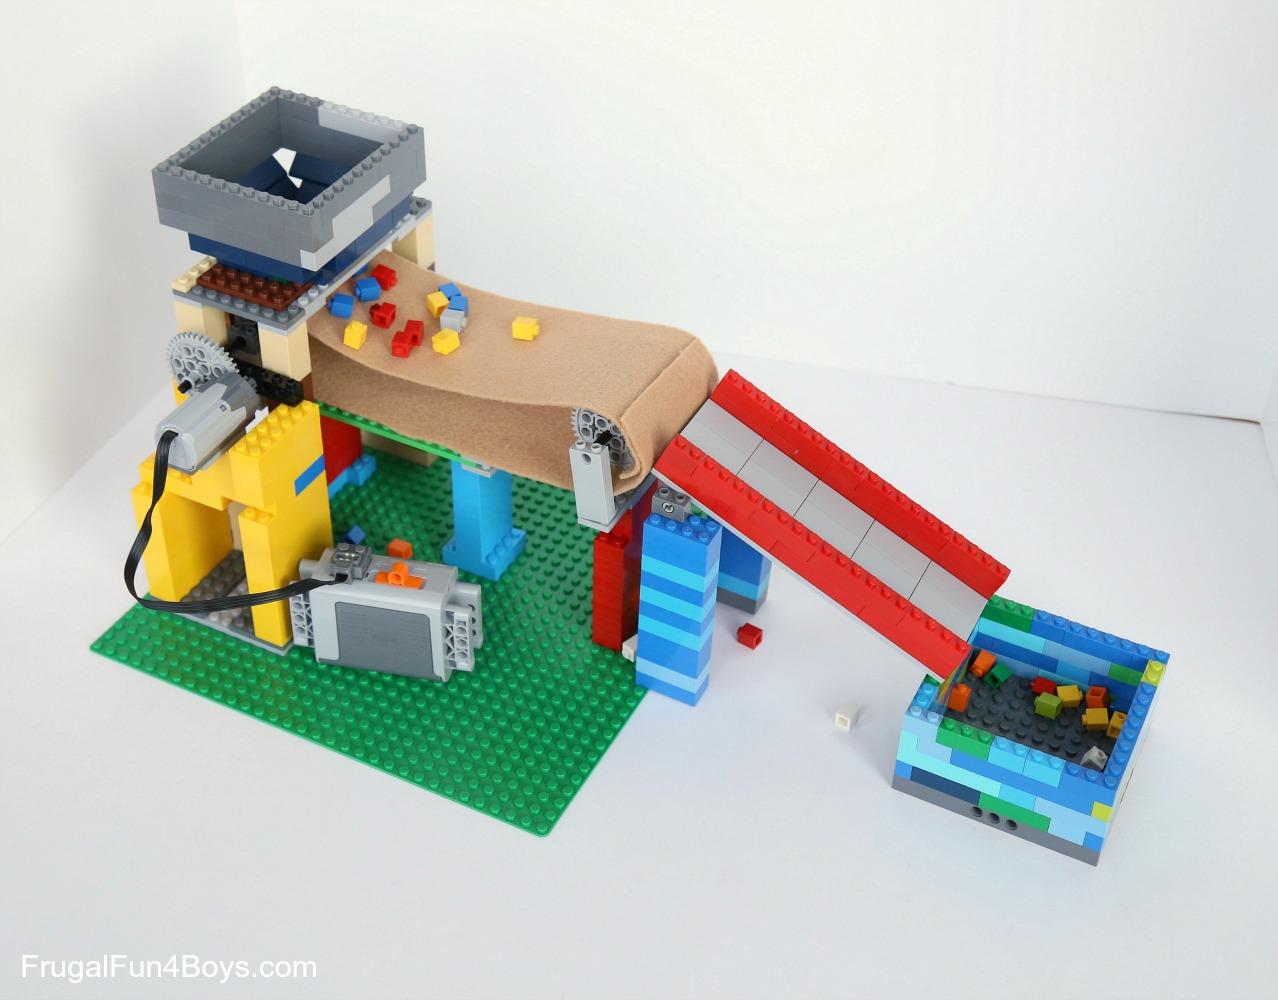 Build A Working Conveyor Belt With Lego Bricks Frugal